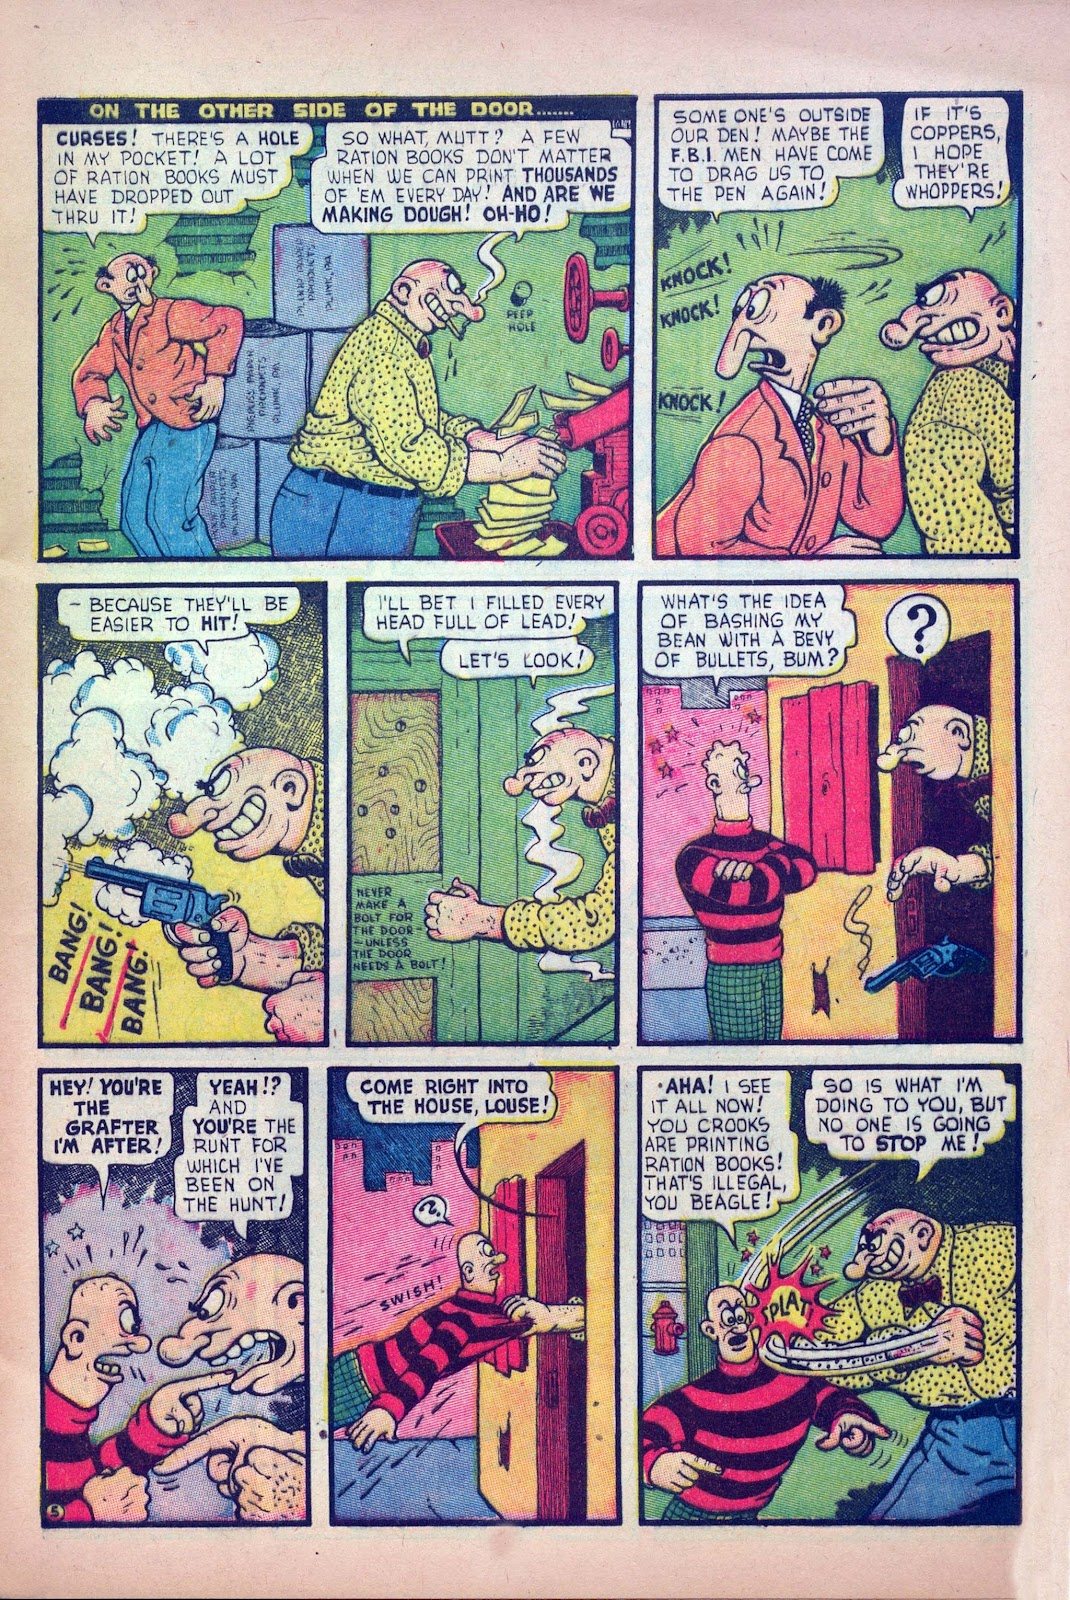 Read online Joker Comics comic -  Issue #13 - 7